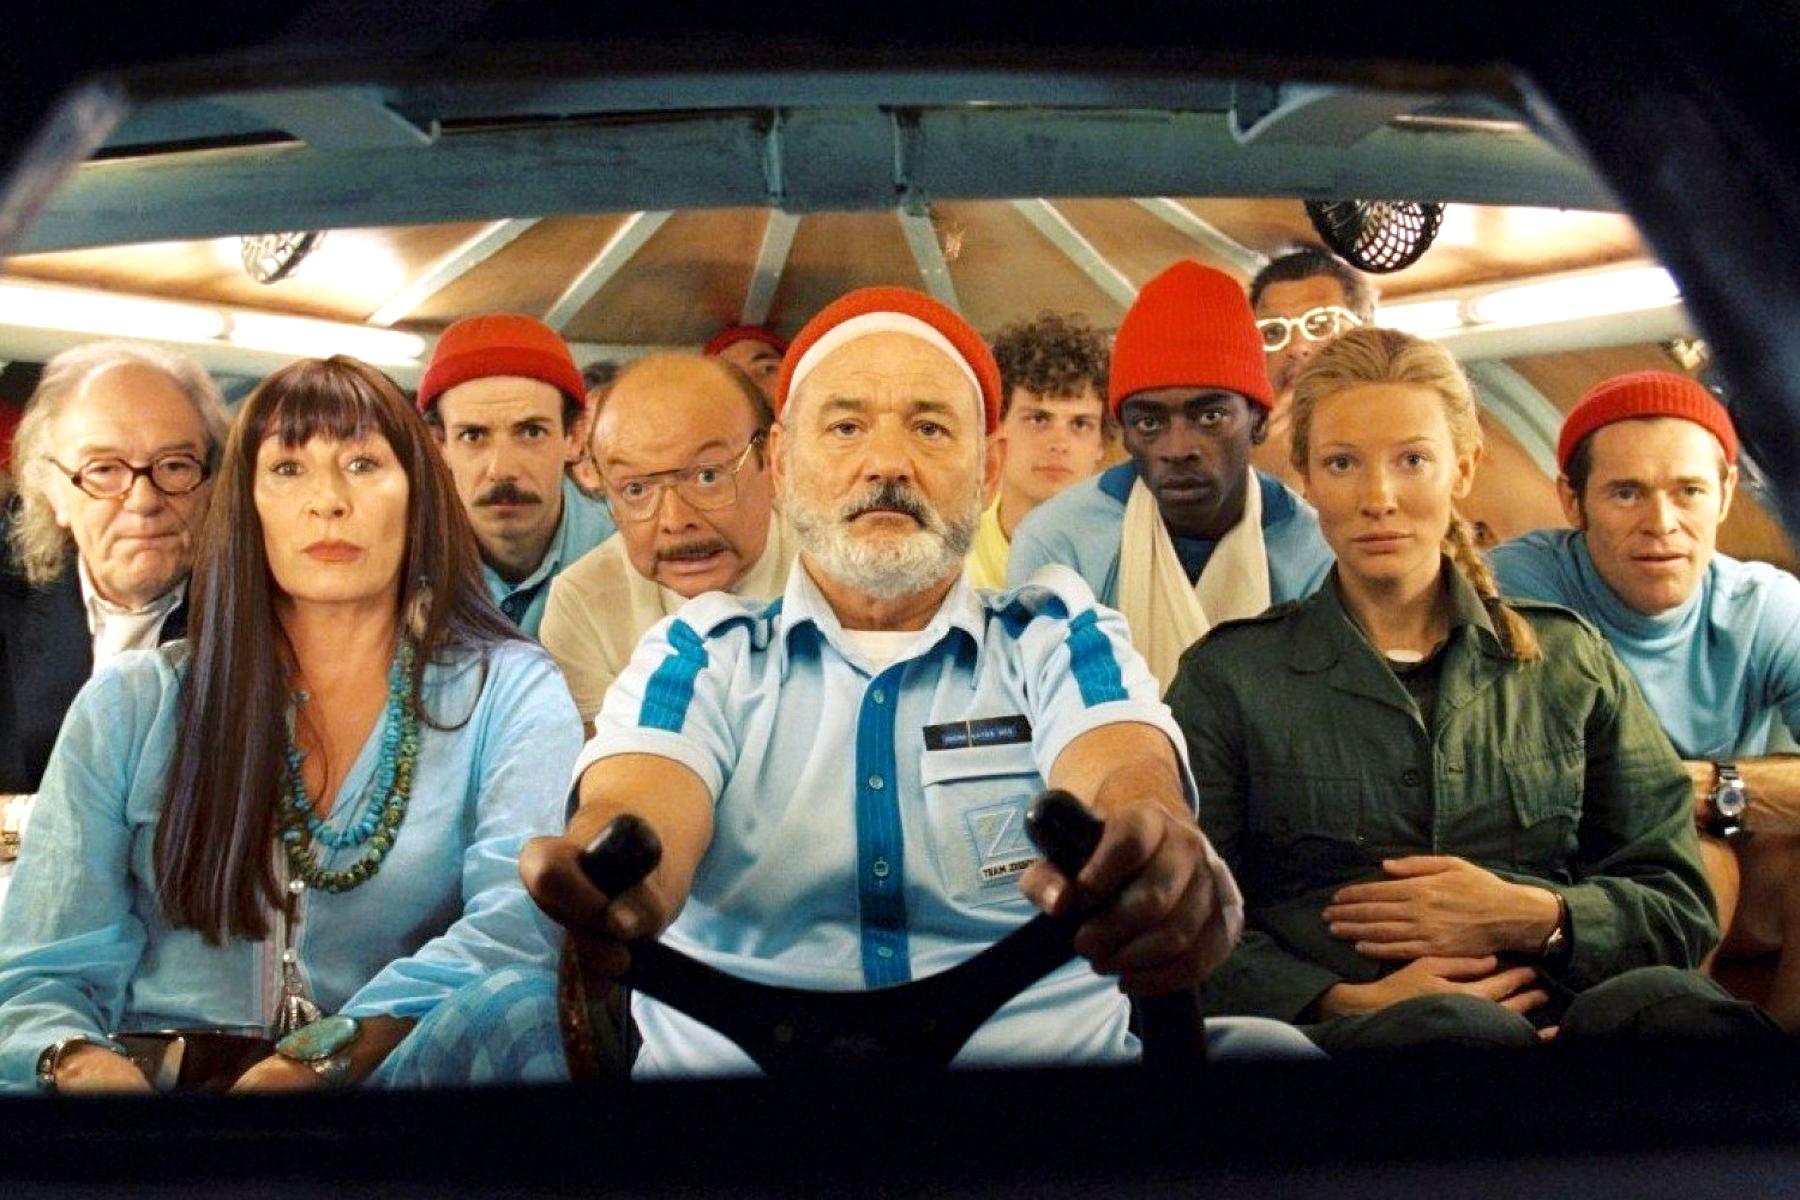 Scene005 The Life Aquatic with Steve Zissou (2004)